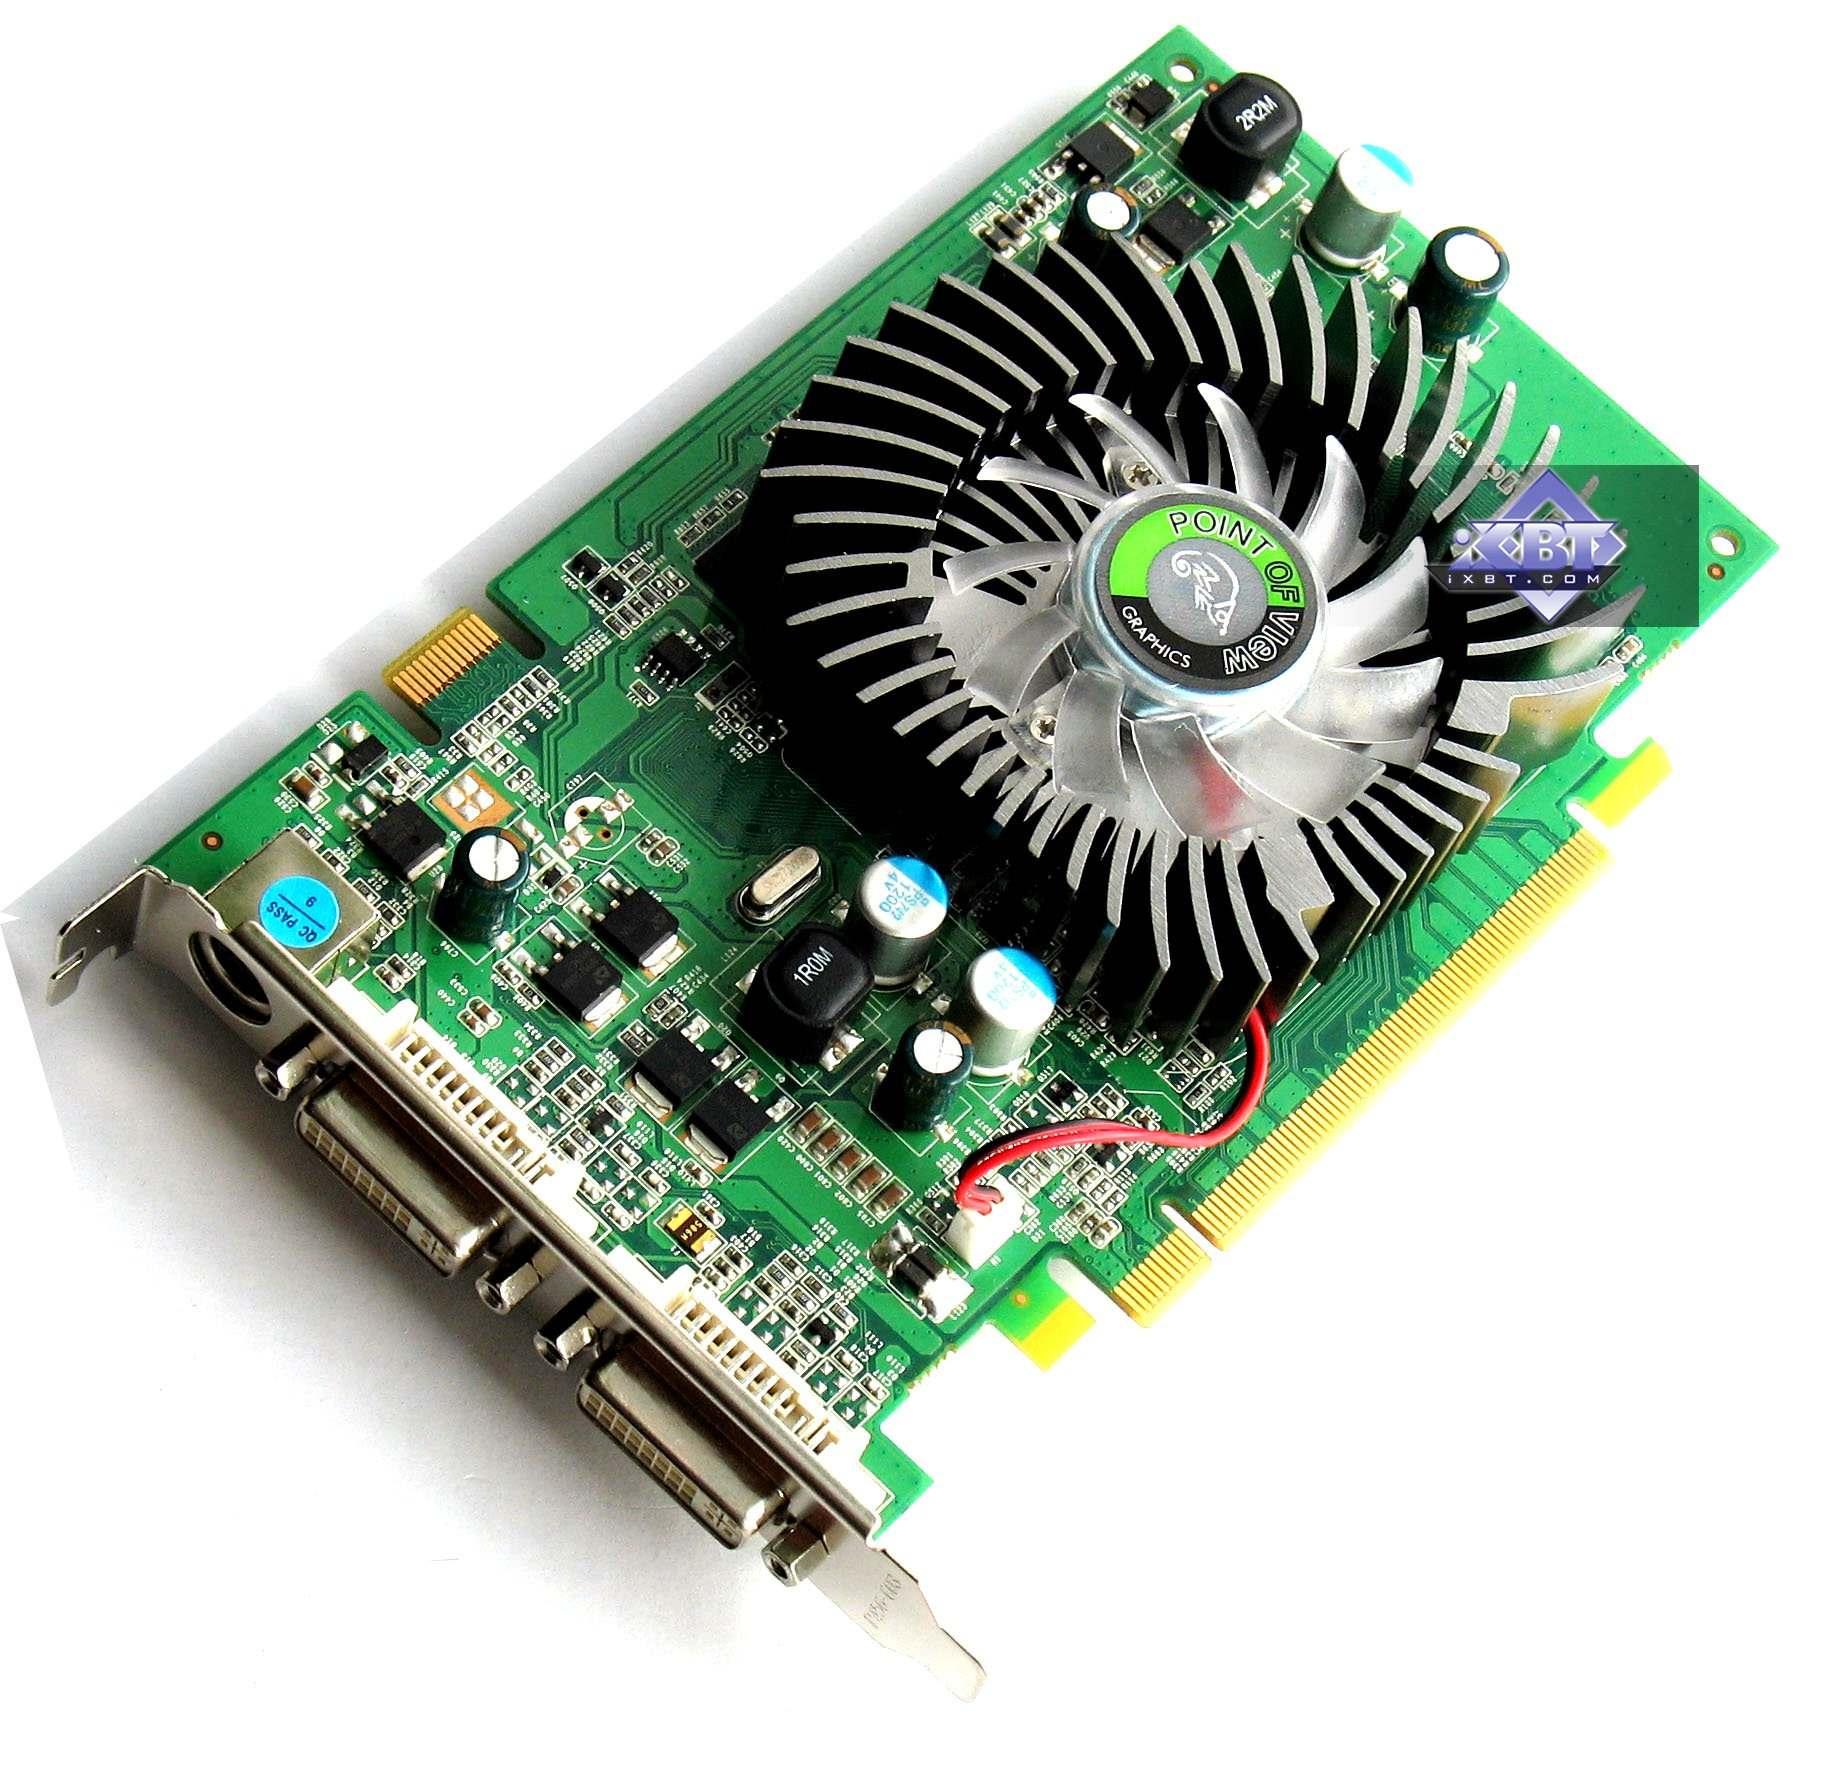 Evga geforce 8600 gt video card 512mb ddr3, pci express, sli.